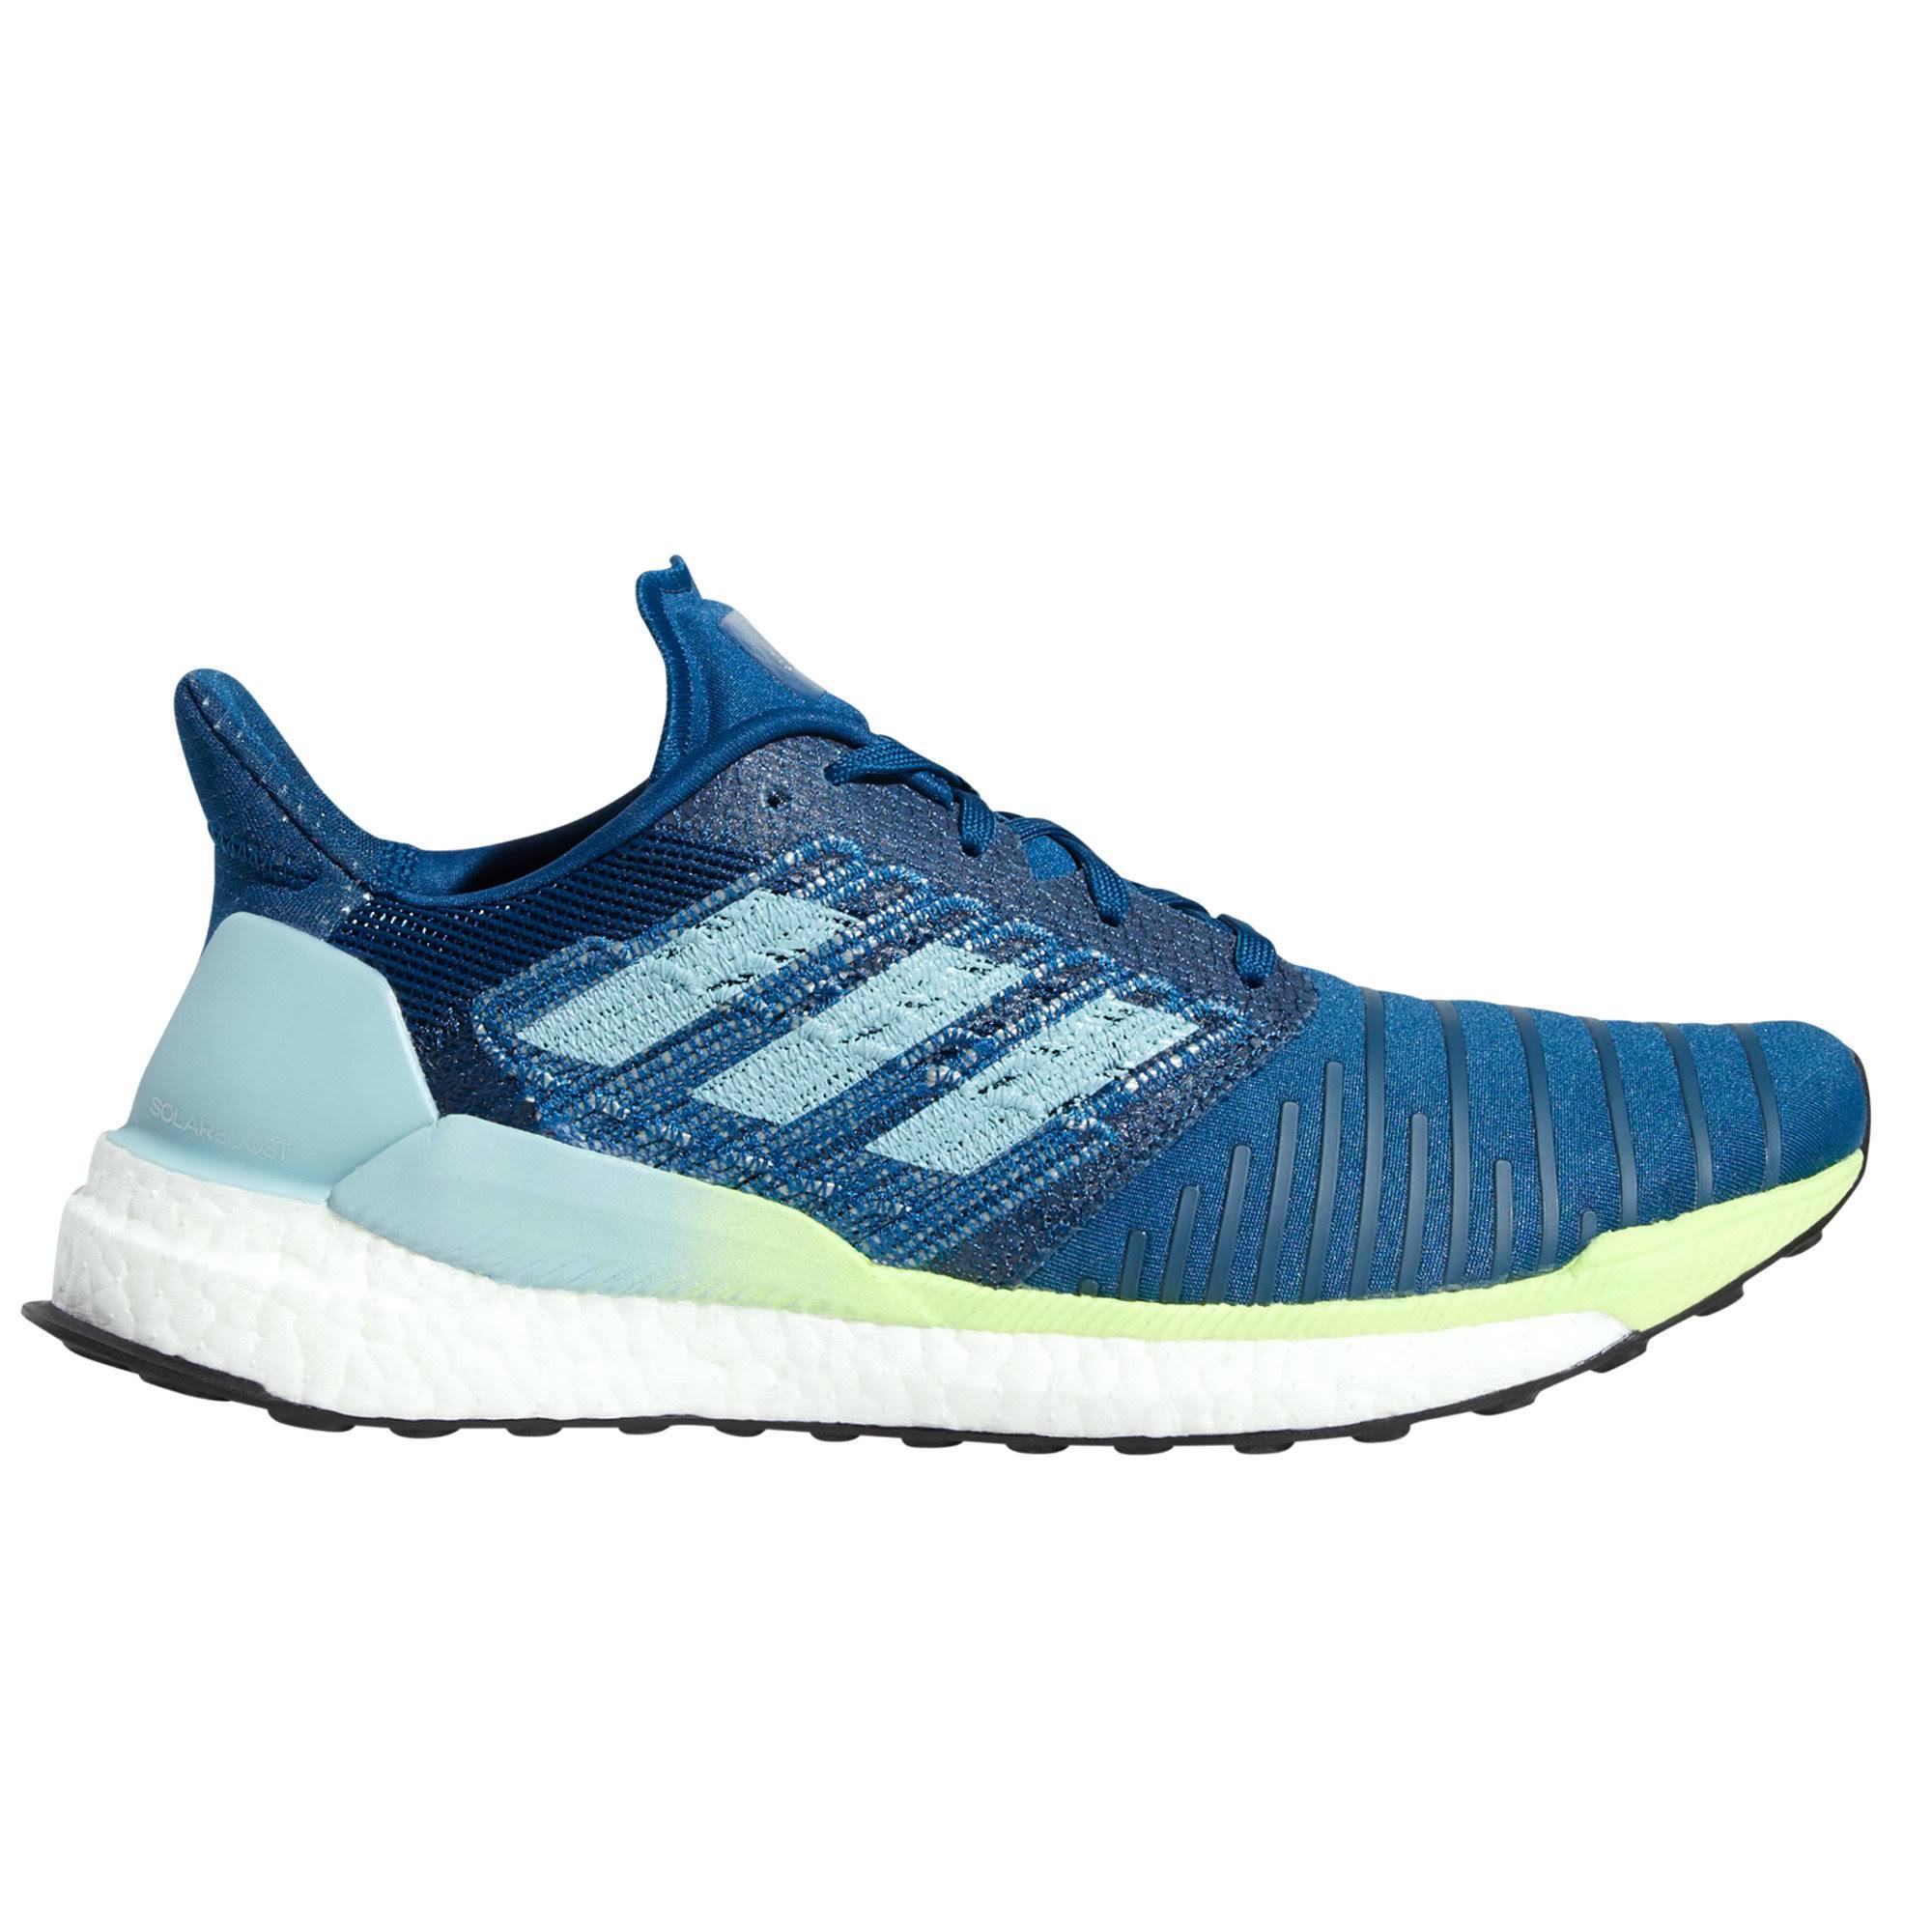 (Blue, UK 7) adidas Solar Boost Mens Fitness Running Trainer Shoe Blue/Yellow